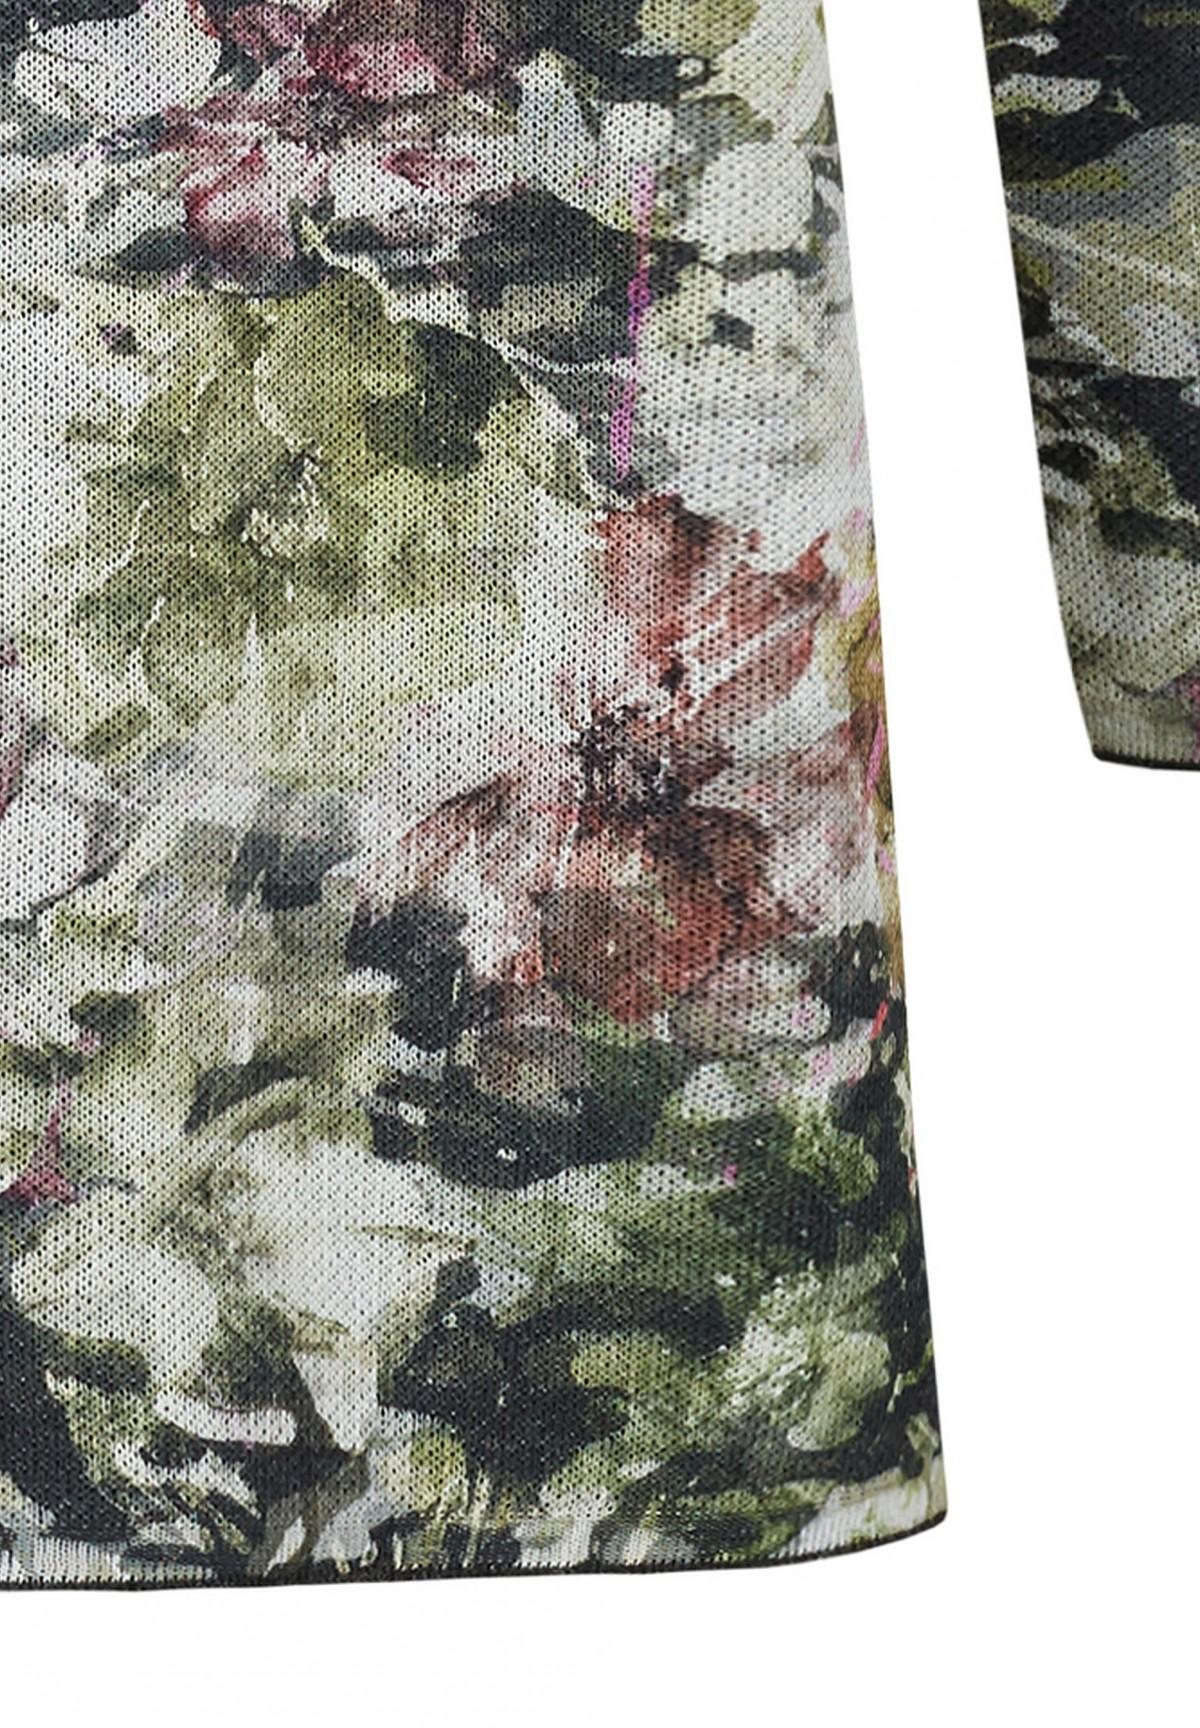 Pullover mit Blumenprint / Pullover mit Blumenprint